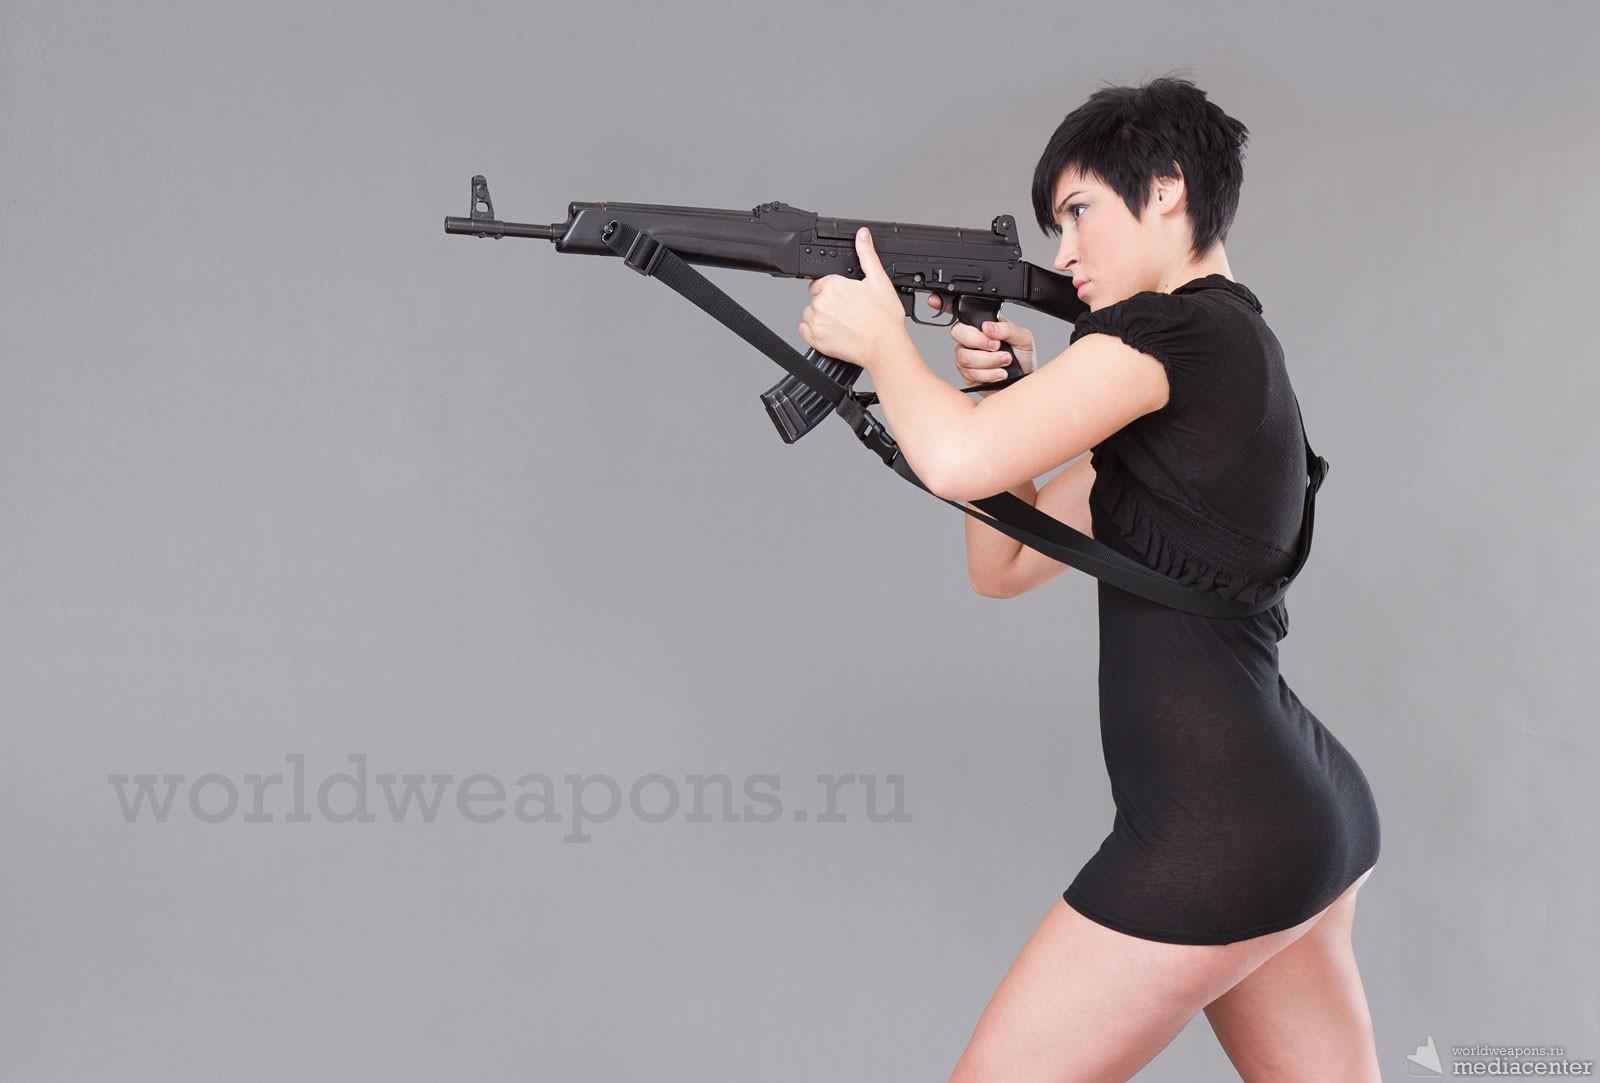 Девушки с оружием. Автомат. Обои. Подборка.